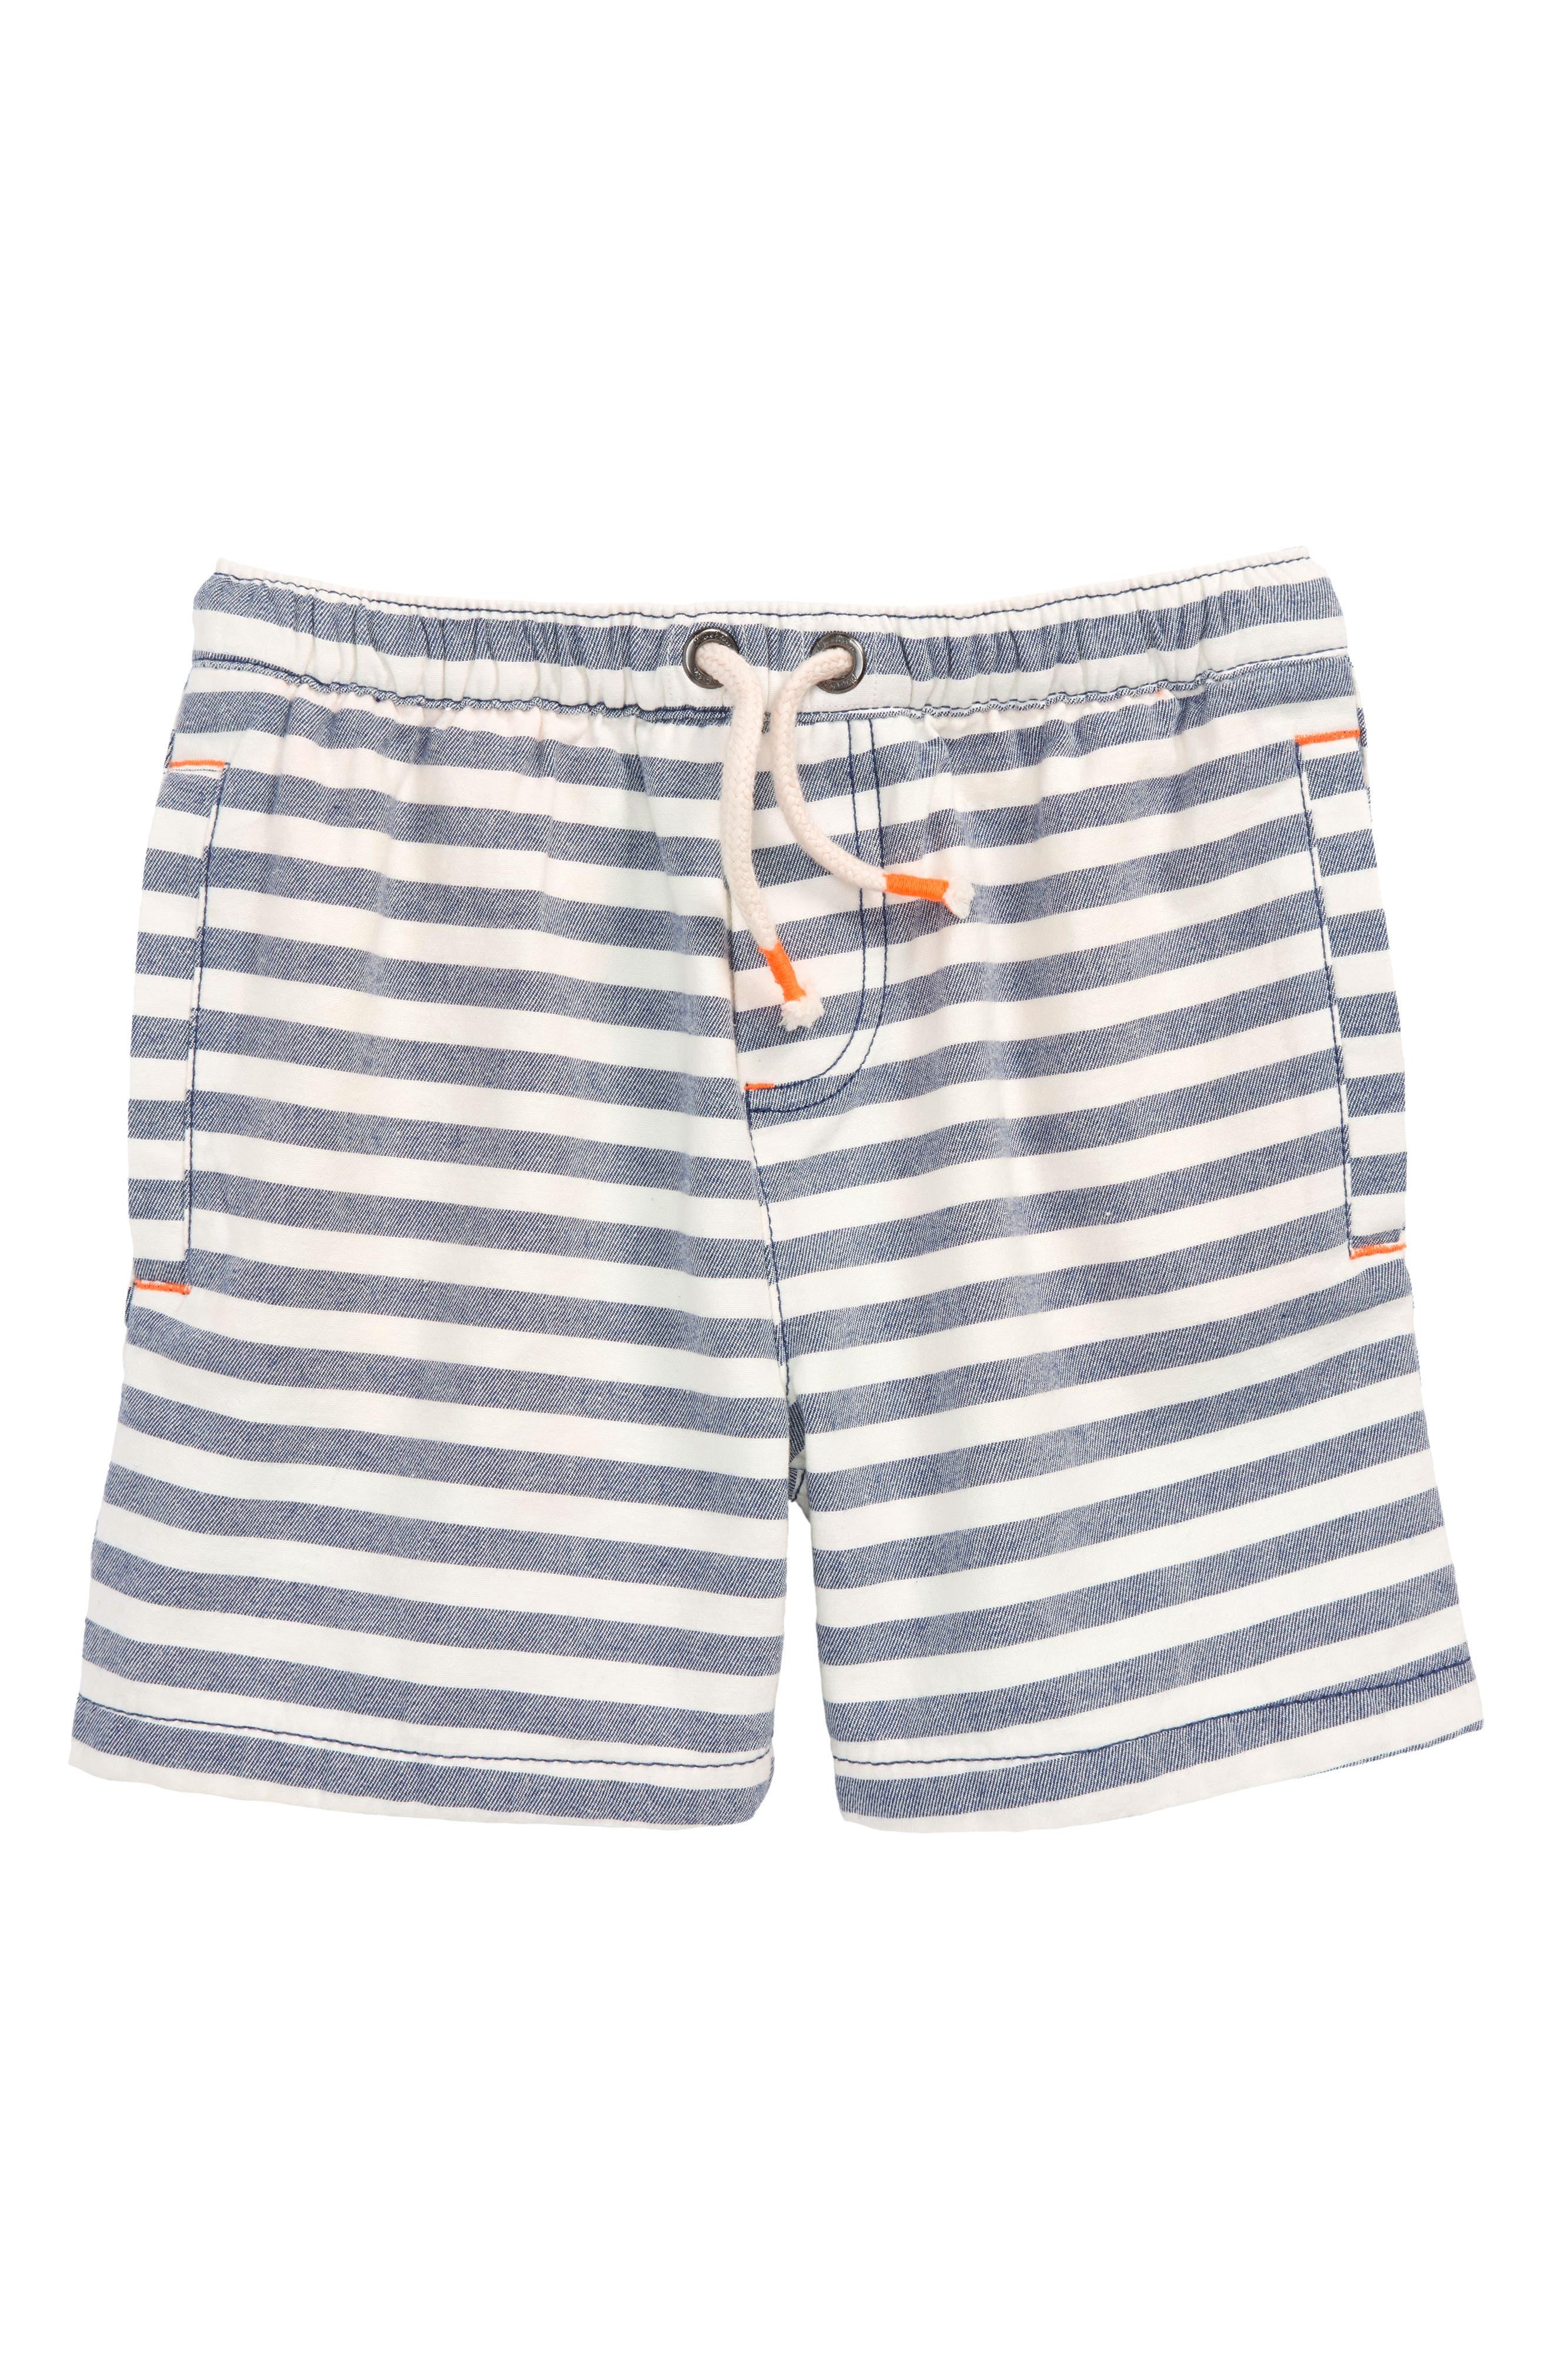 Stripe Drawstring Shorts,                             Main thumbnail 1, color,                             414